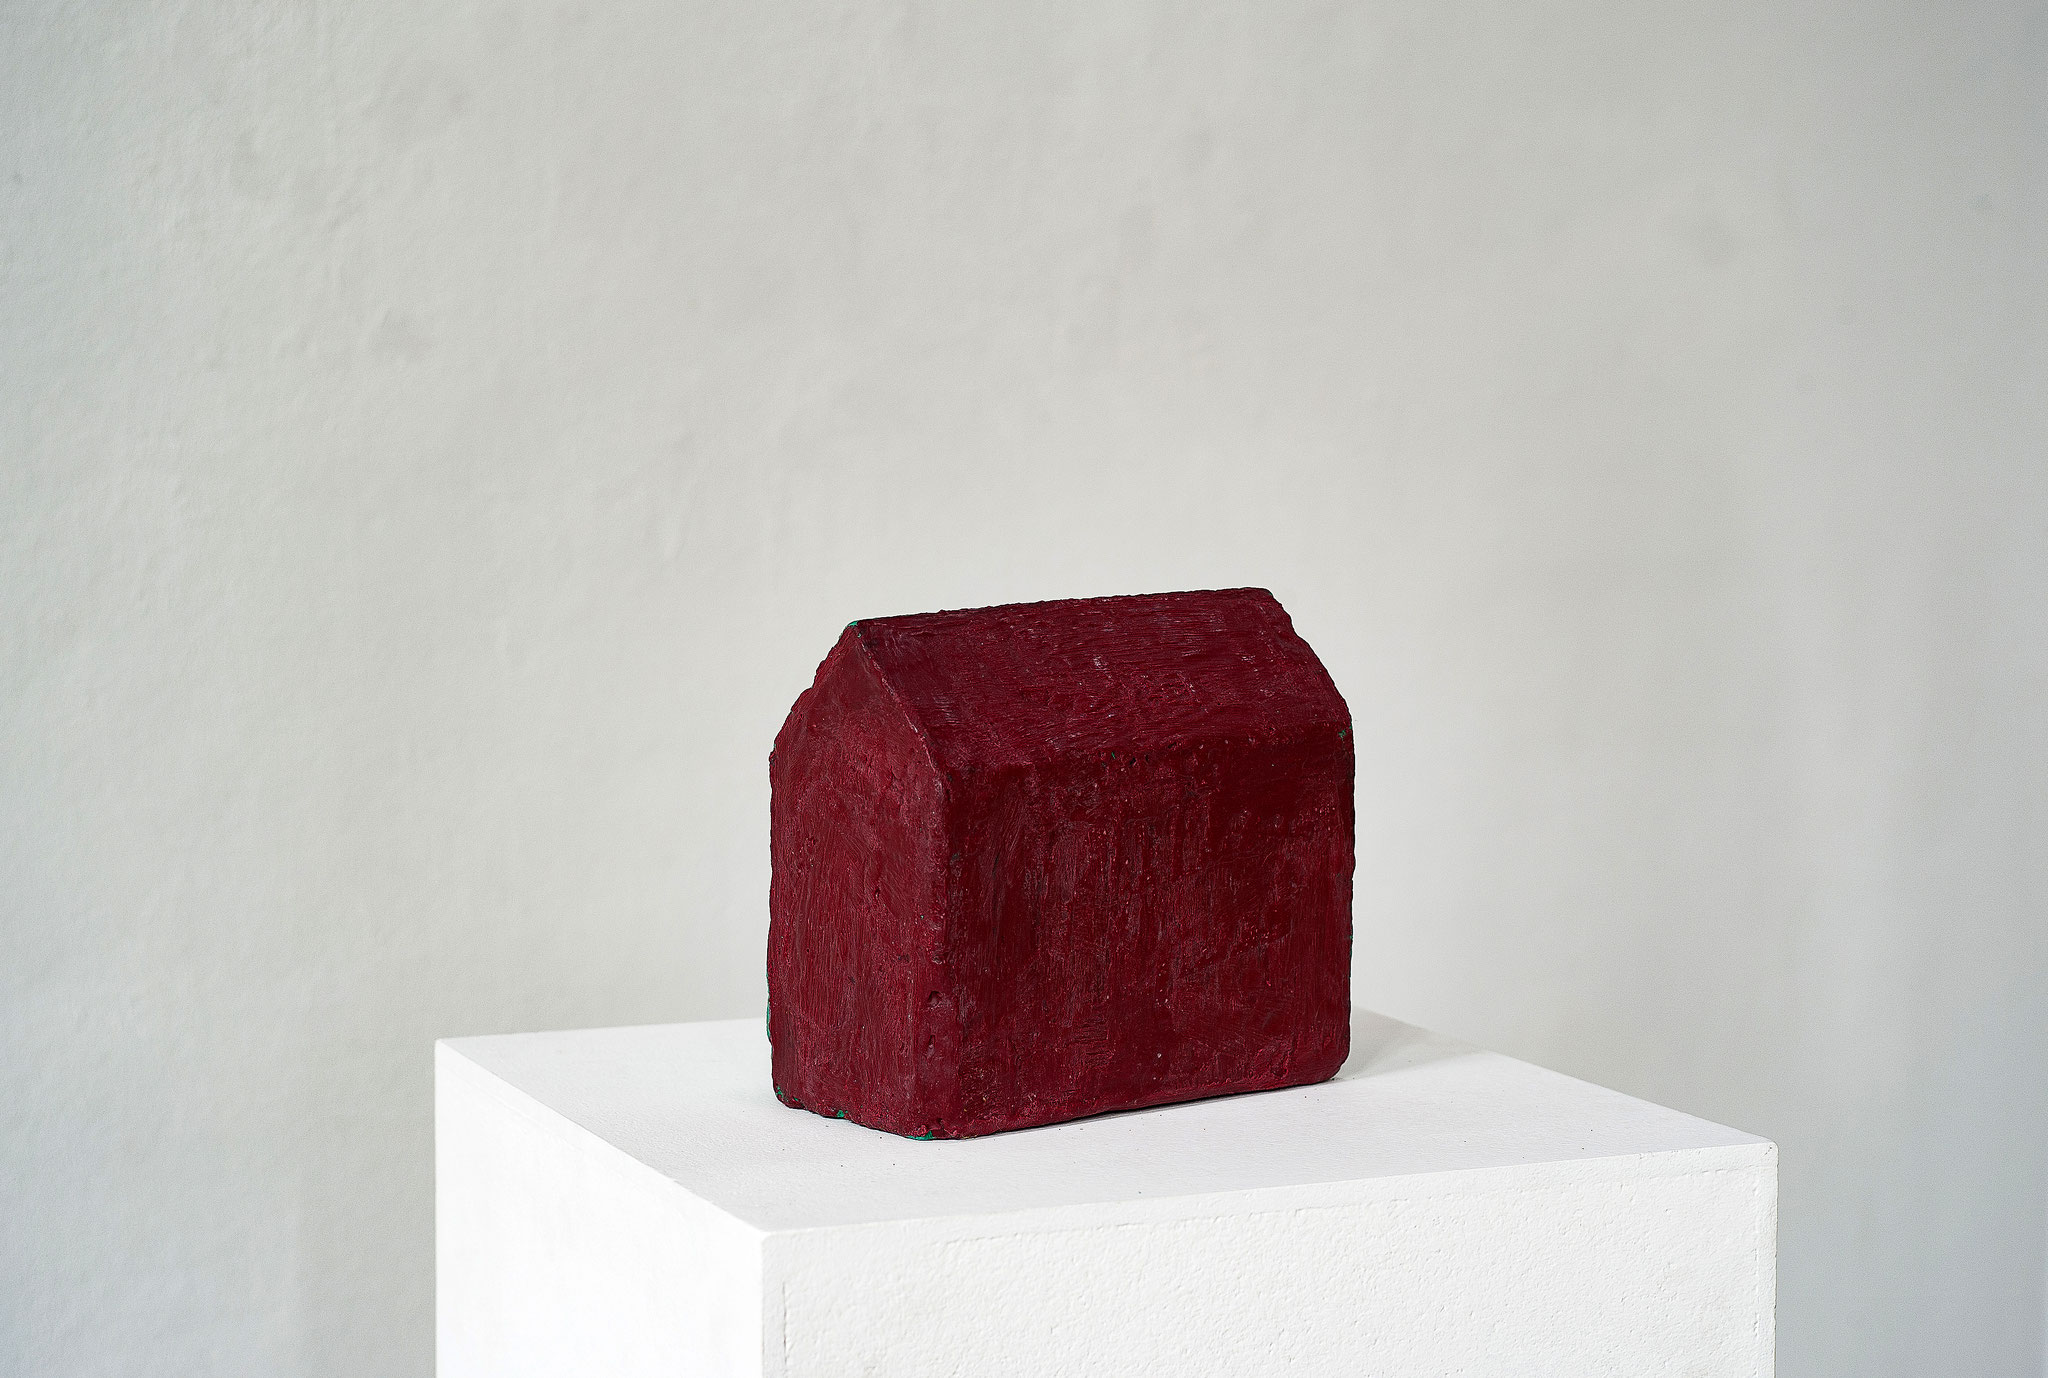 Schwarzbauten Nr.2  2016  Betonguss, Wachs, Pigment 9 x 22 x 11 cm